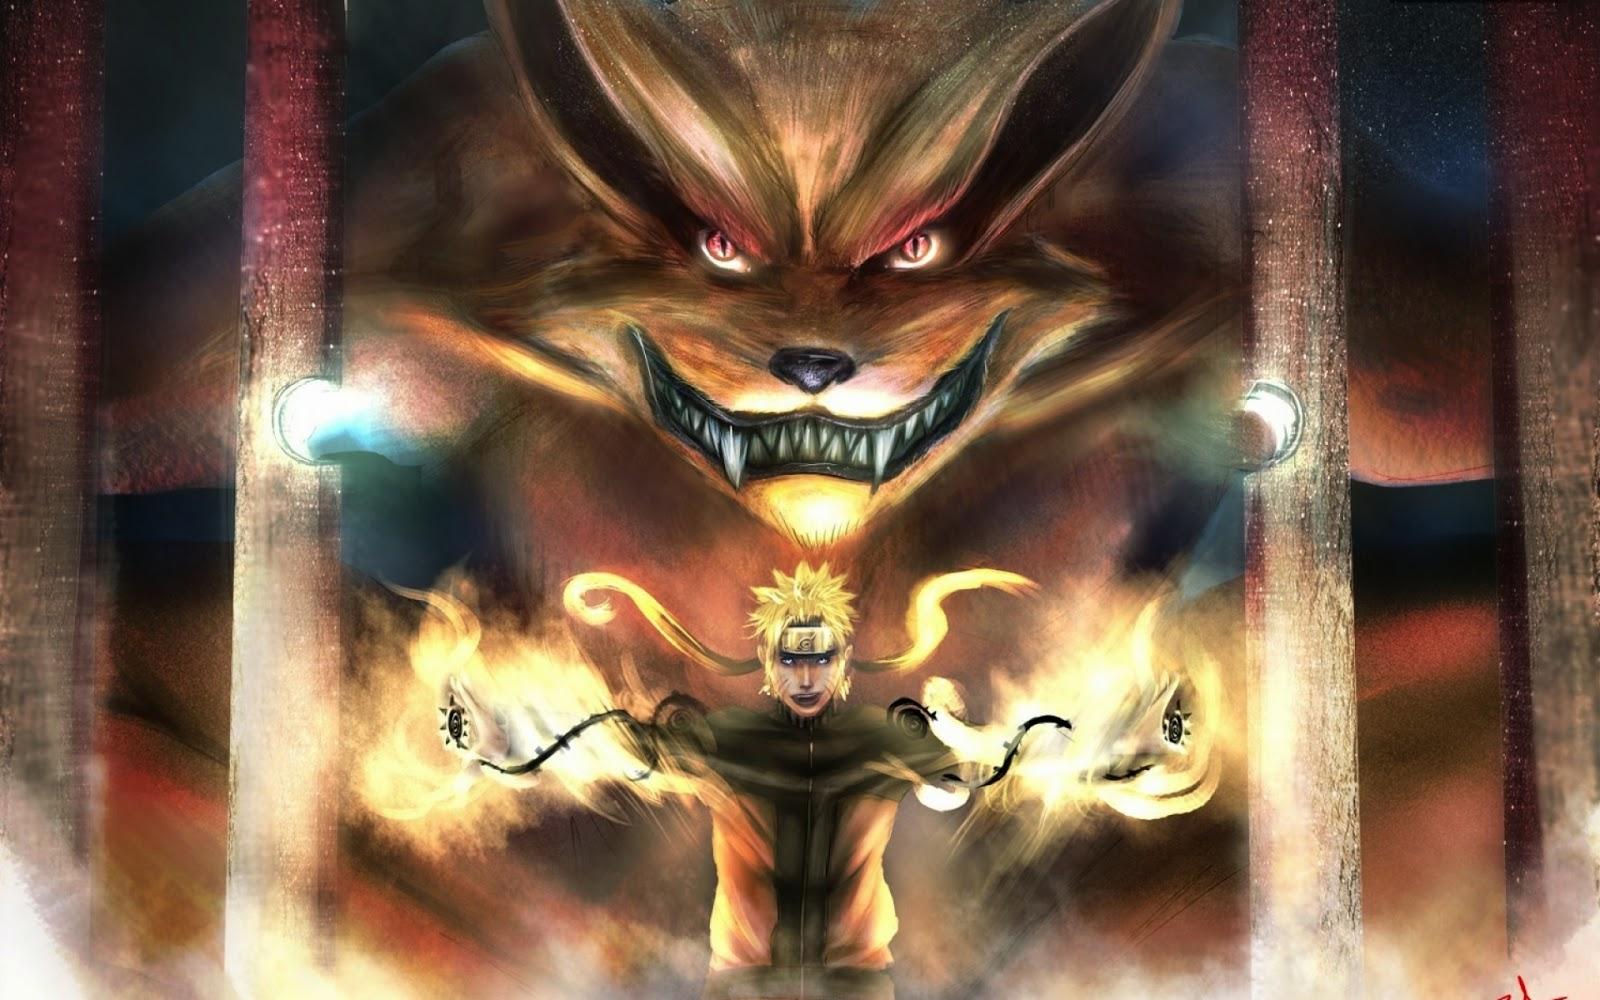 Meilleurs Fonds Ecran Hd Naruto Shippuden Uzumaki People Buzz